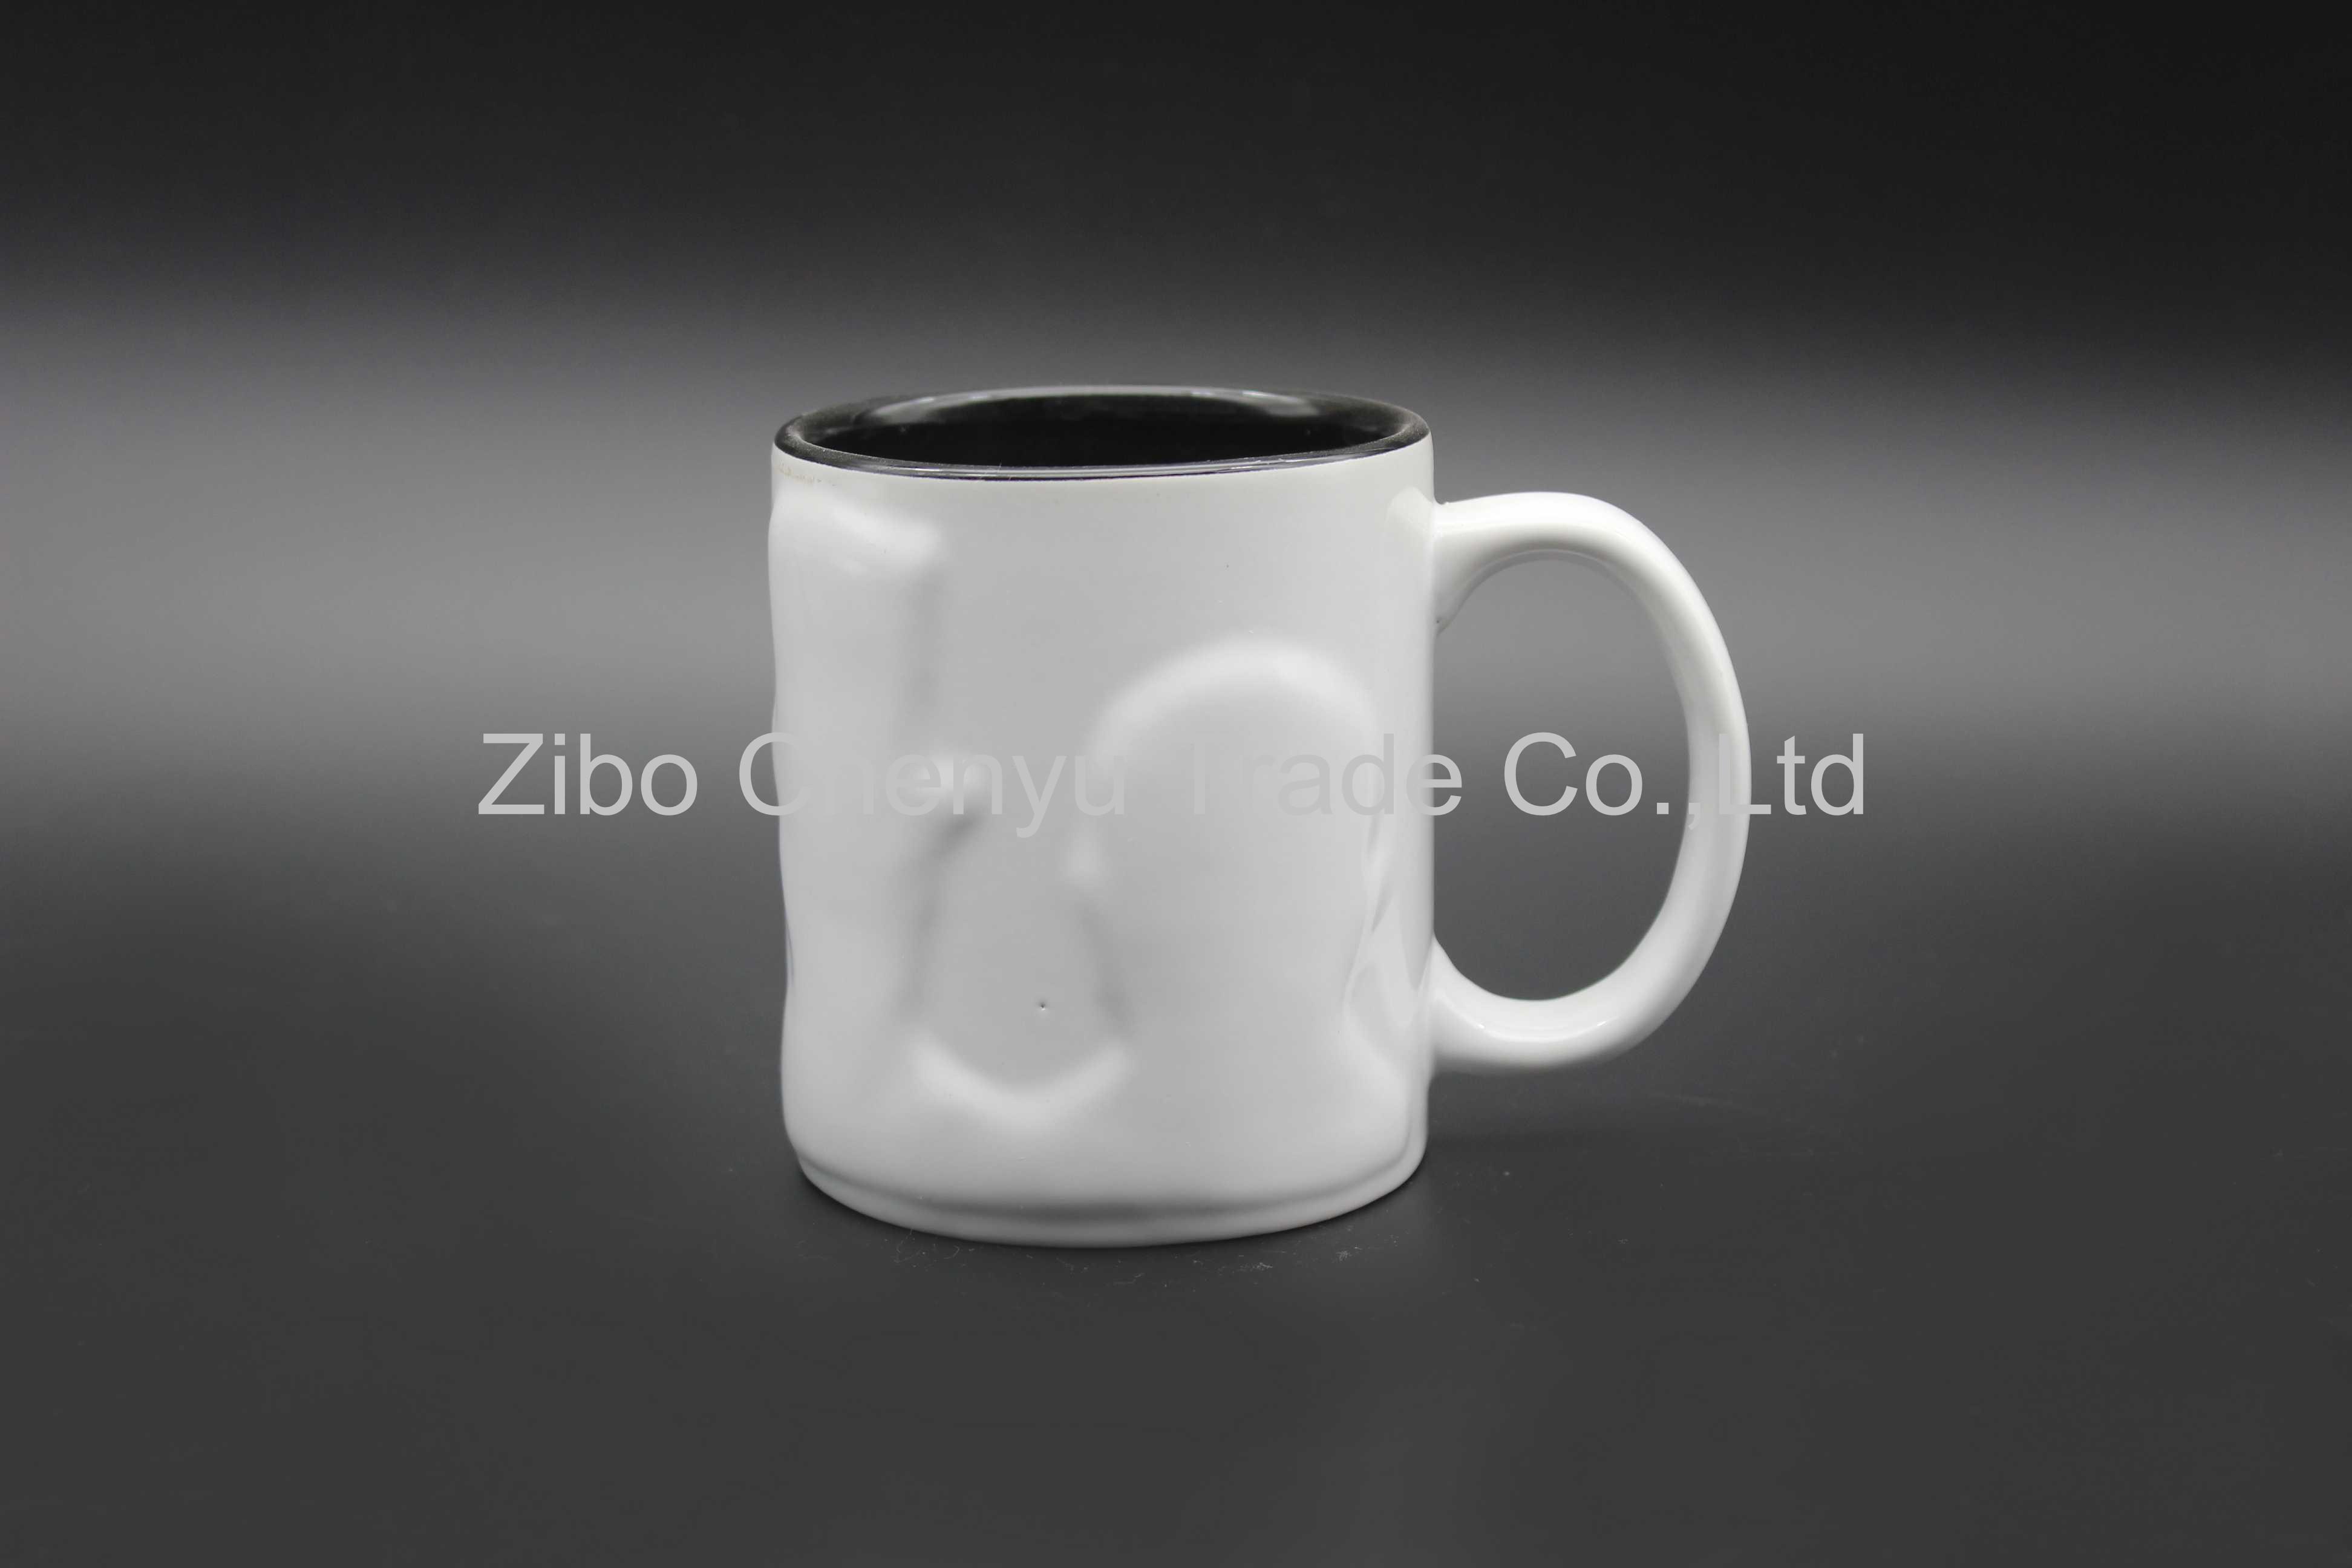 glazing stoneware coffee mug gift product promotion can be OEM